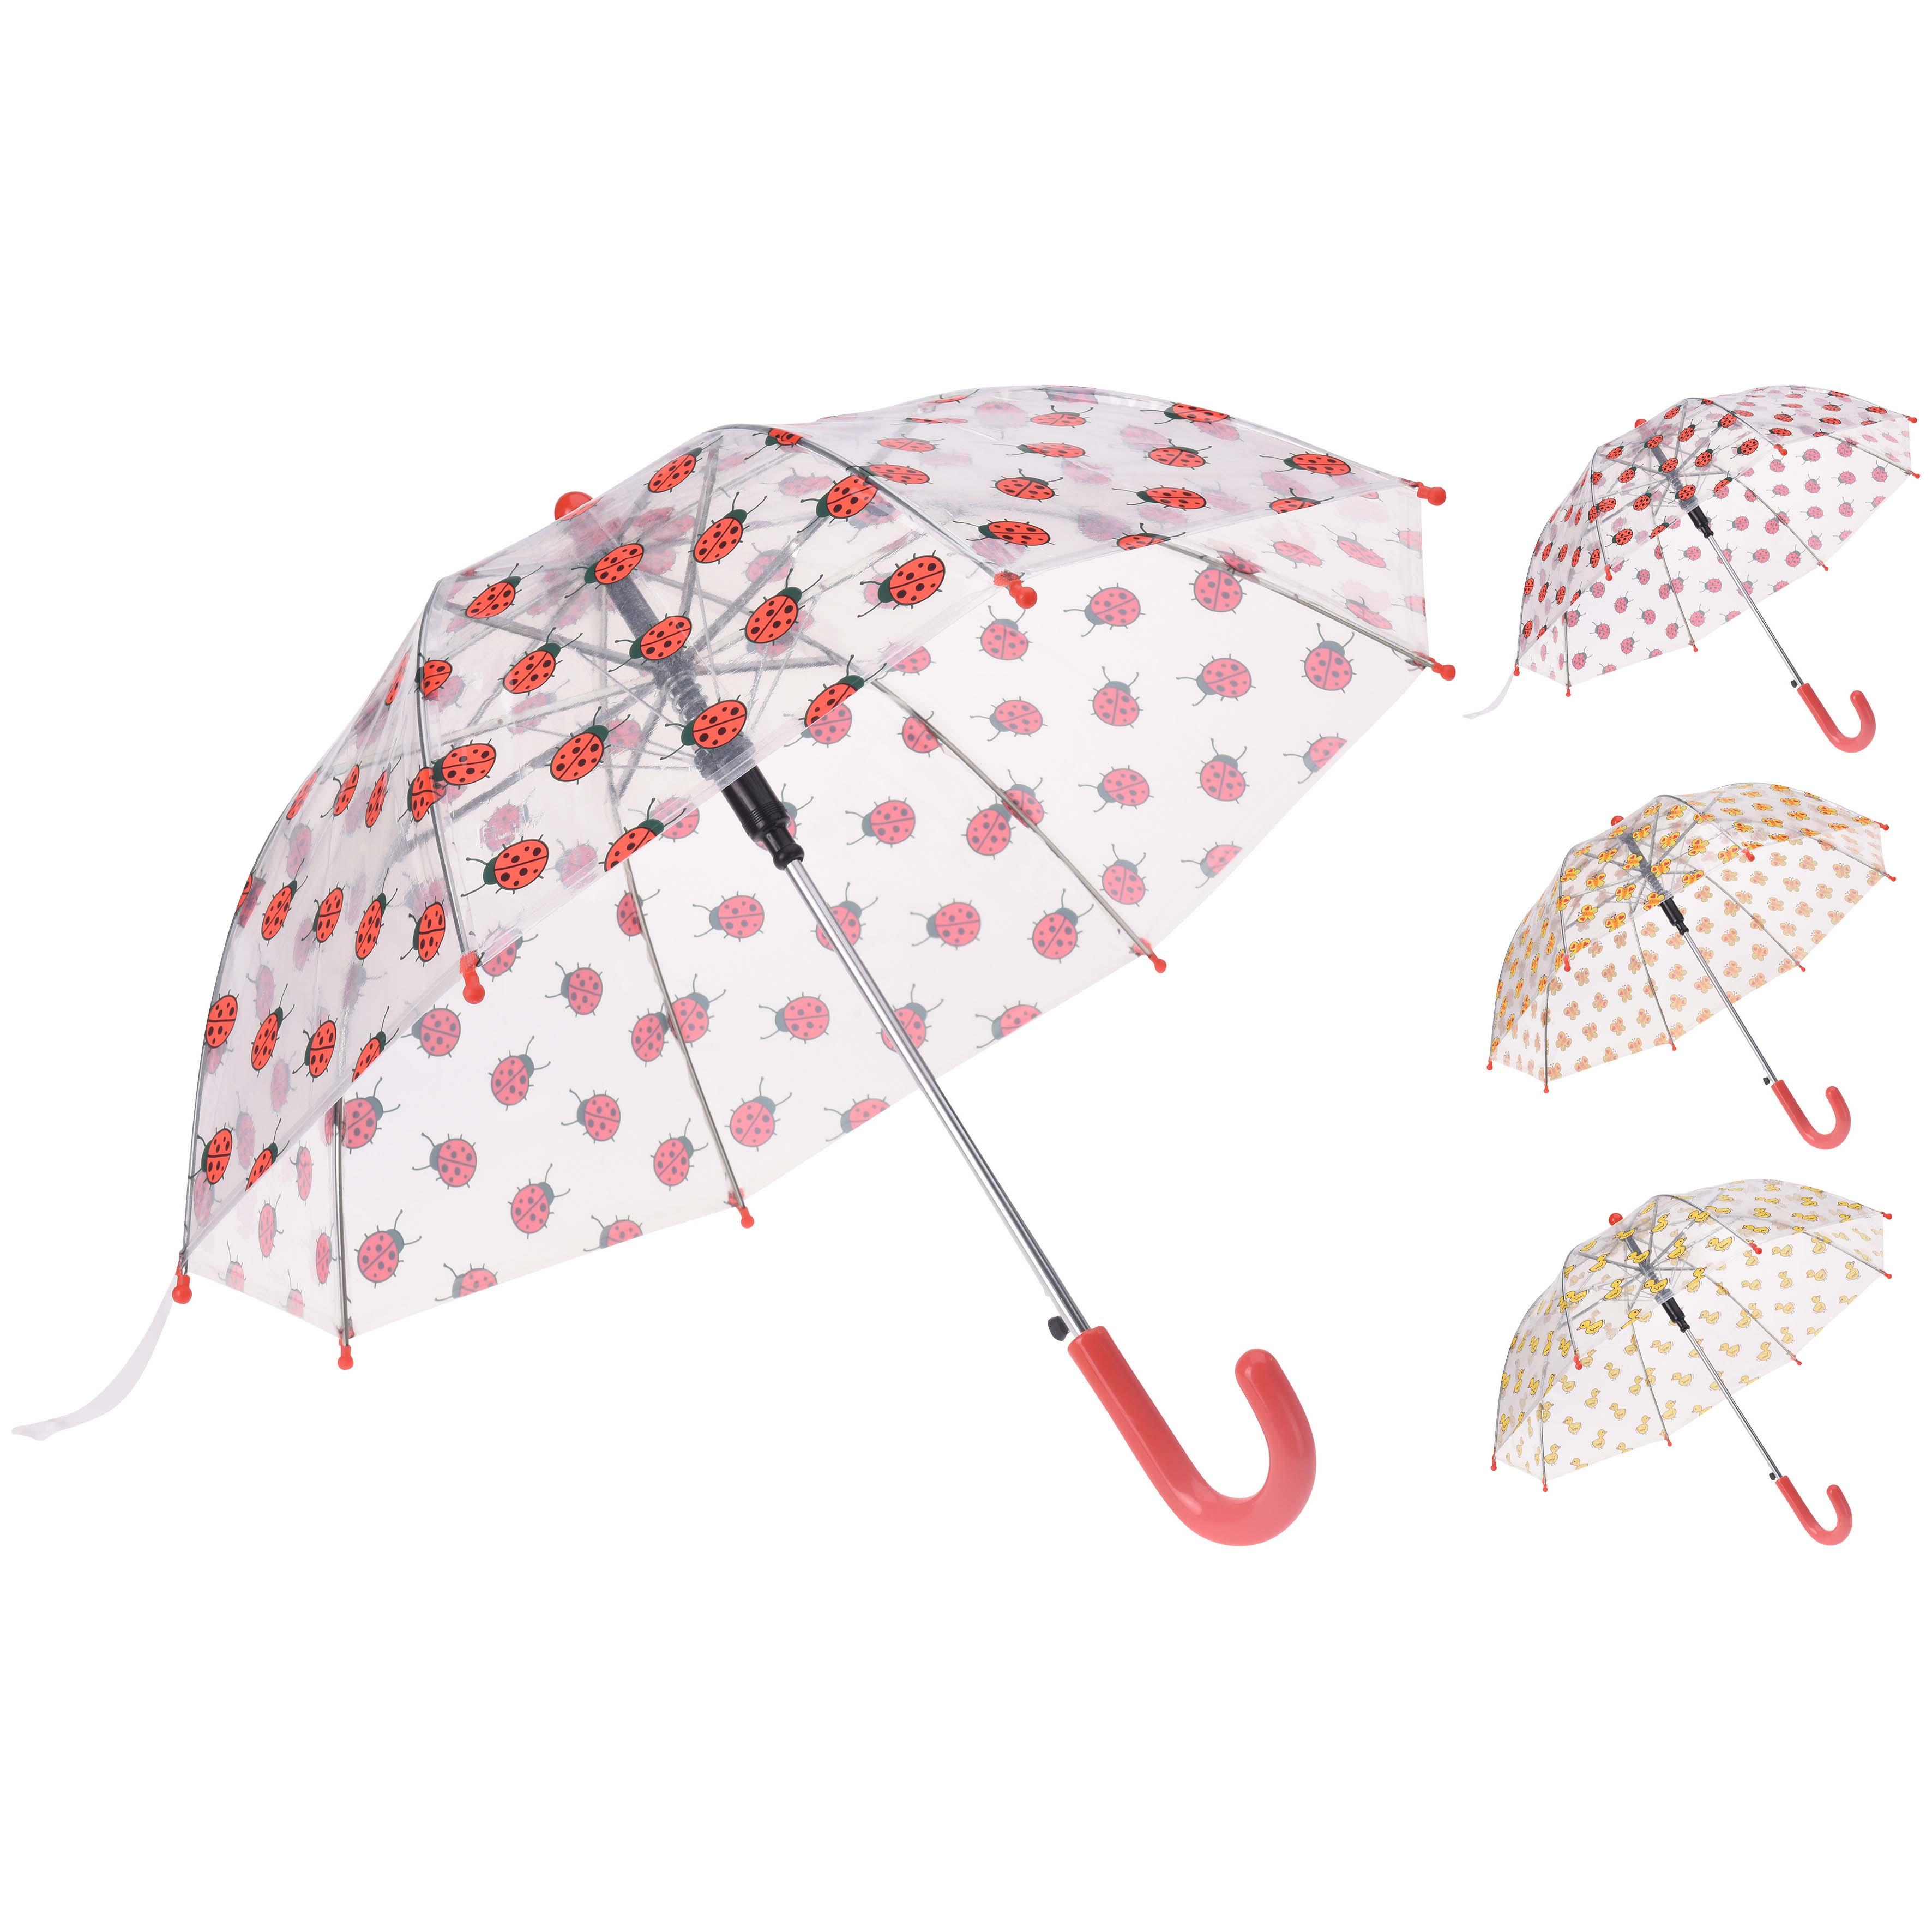 Afbeelding van Paraplu Dieren Transparant Assorti